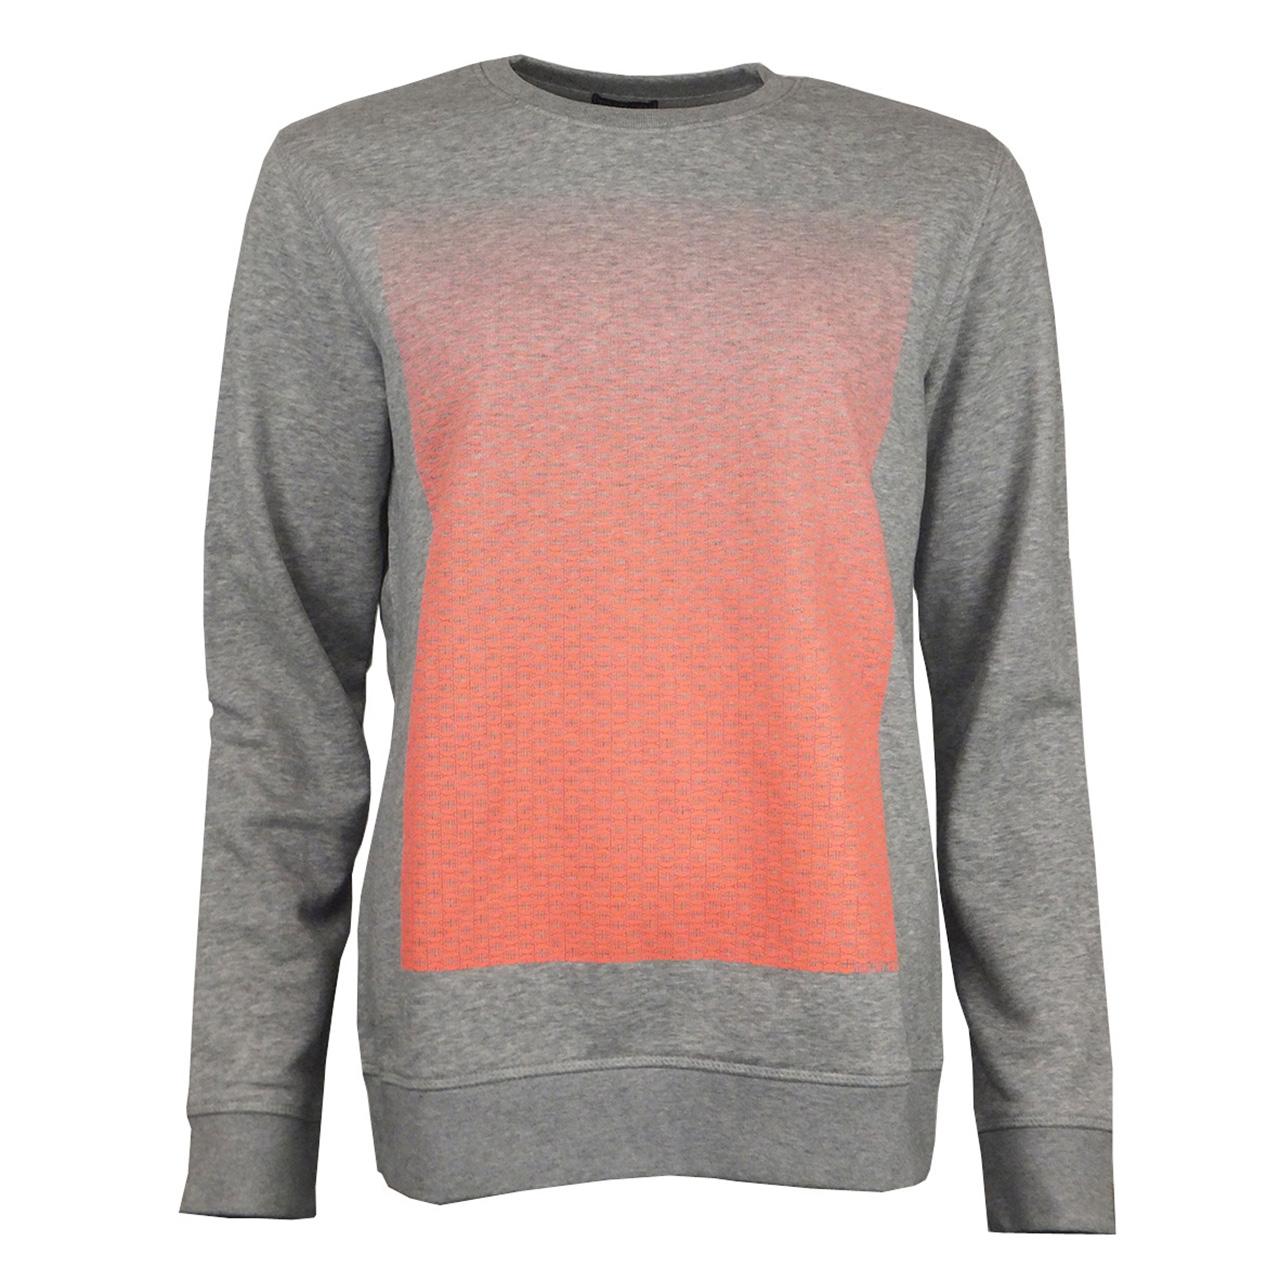 Sweatshirt Brandenburger Tor Verlauf hell-grau/neonorange